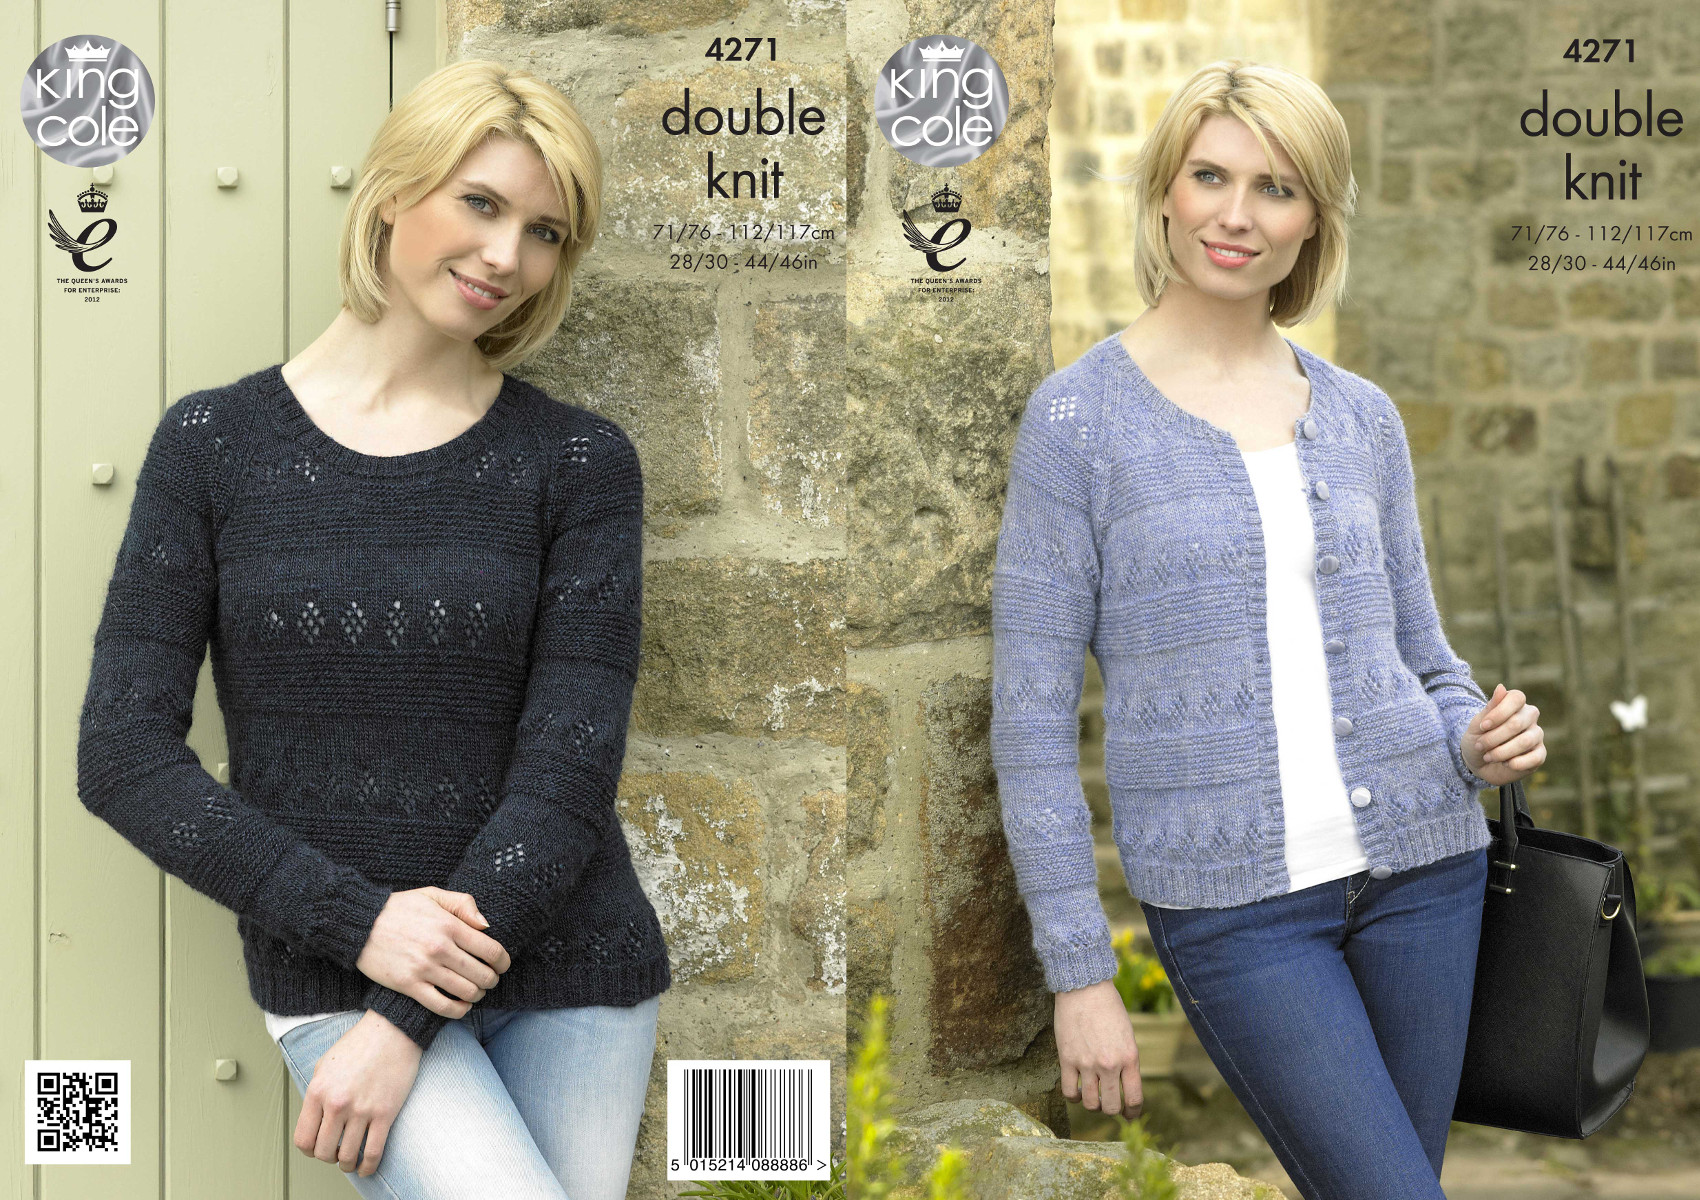 Womens Round Neck Sweater & Cardigan Double Knitting Pattern King ...